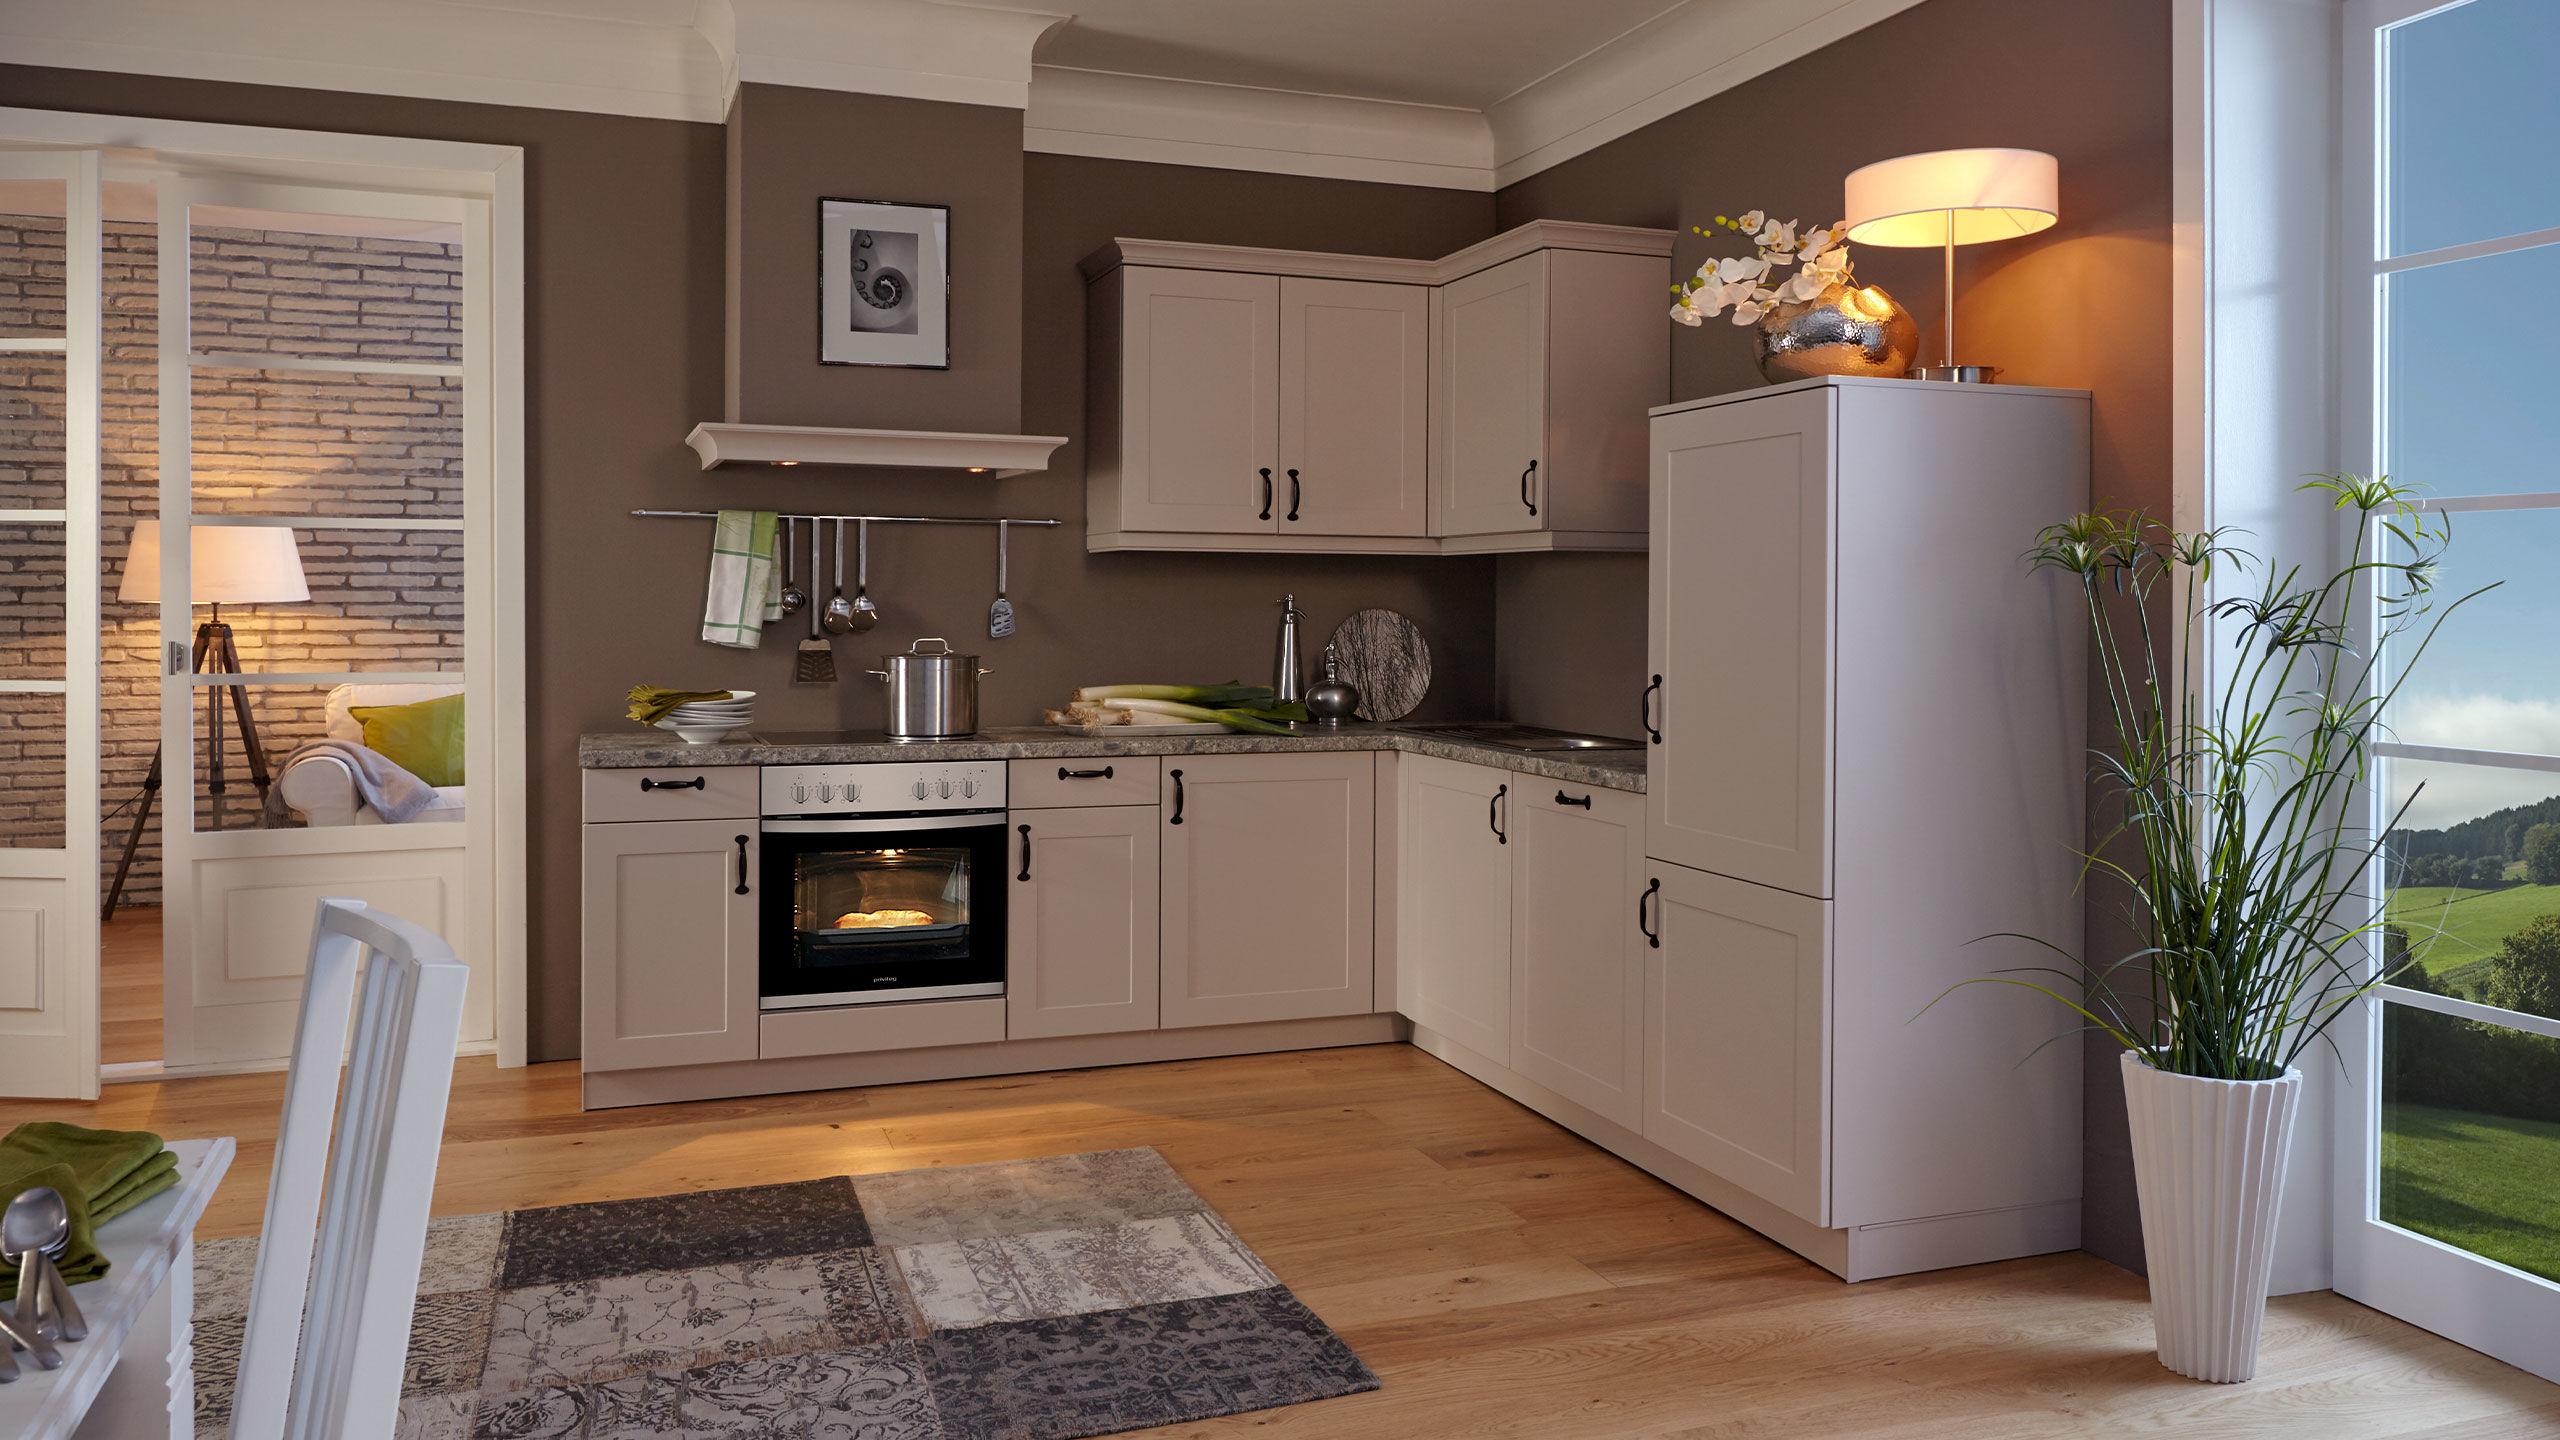 Full Size of Küche L Form Landhaus Küche L Form Küche L Form Modern Komplette Küche L Form Küche Küche L Form